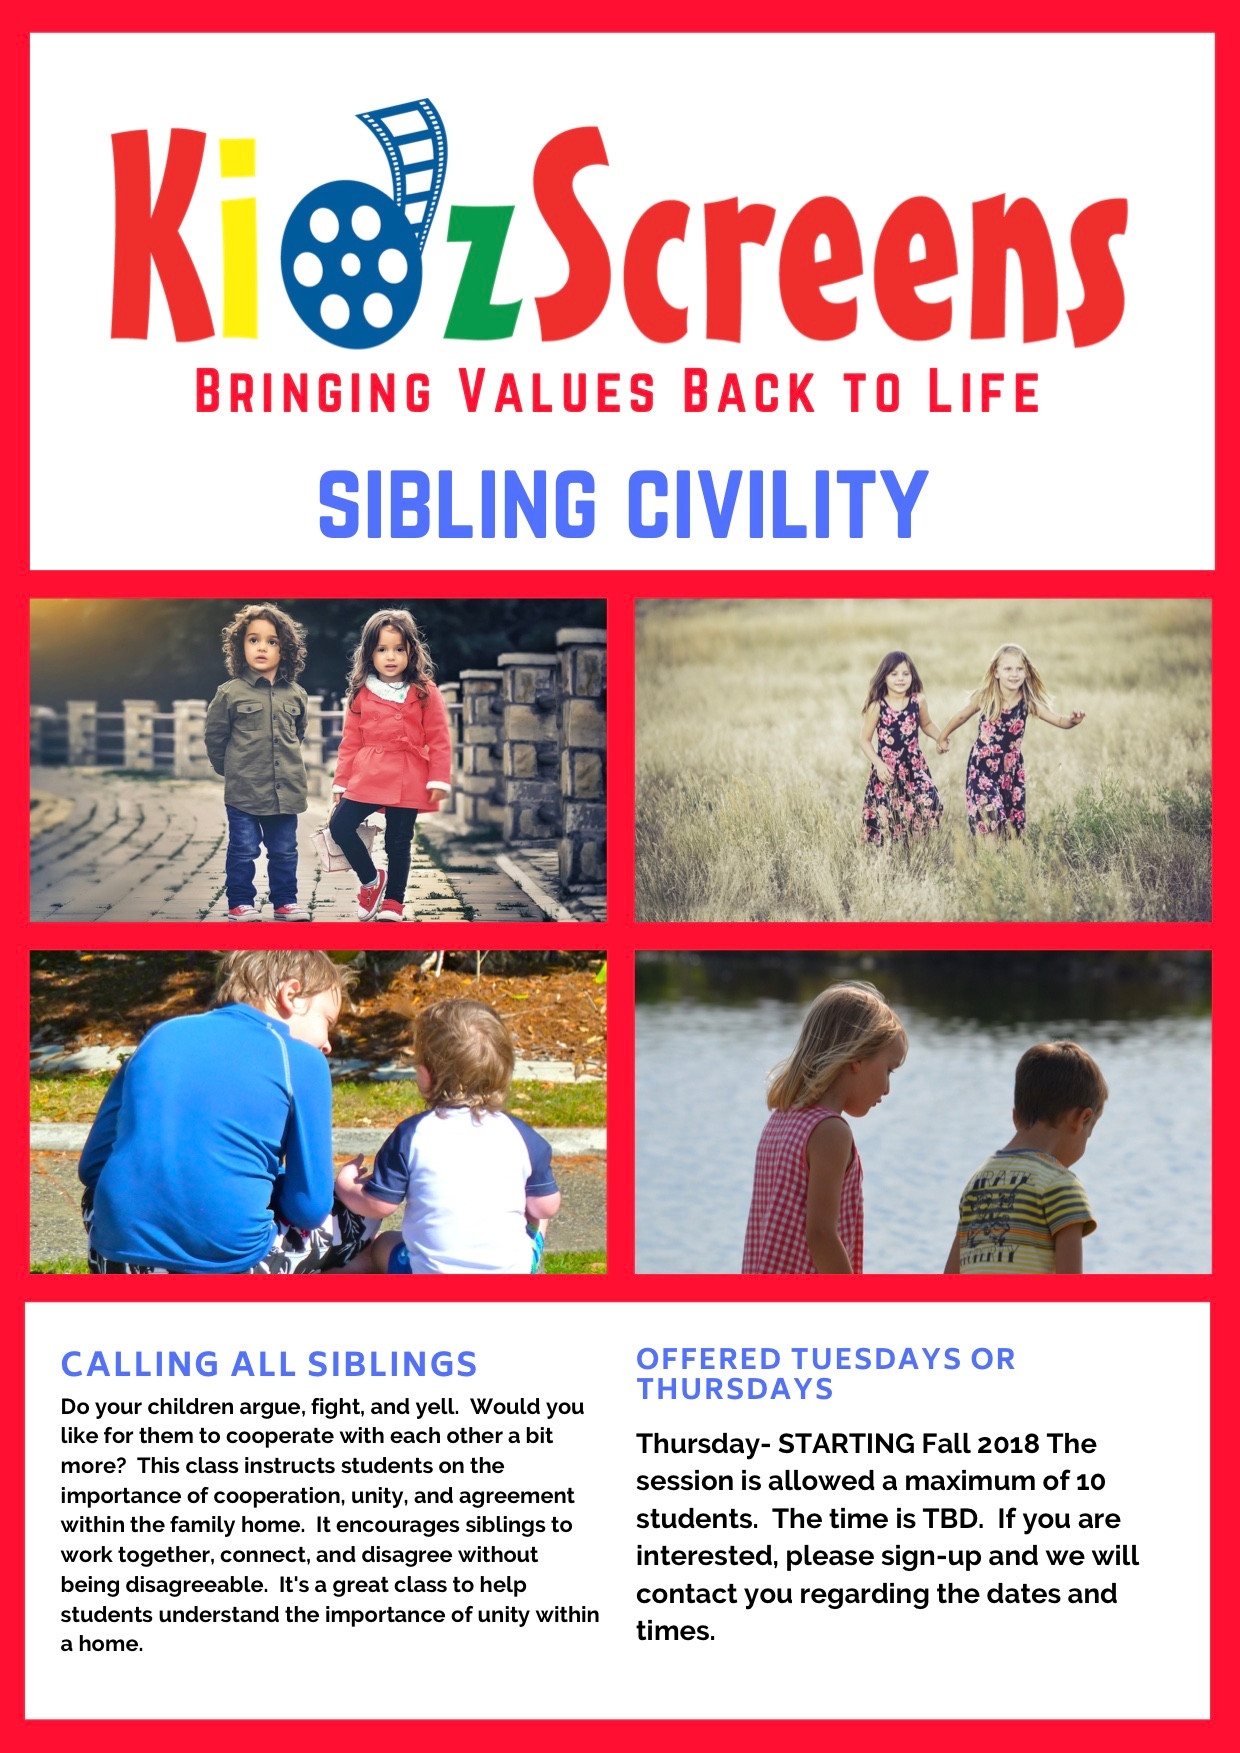 Sibling Civility